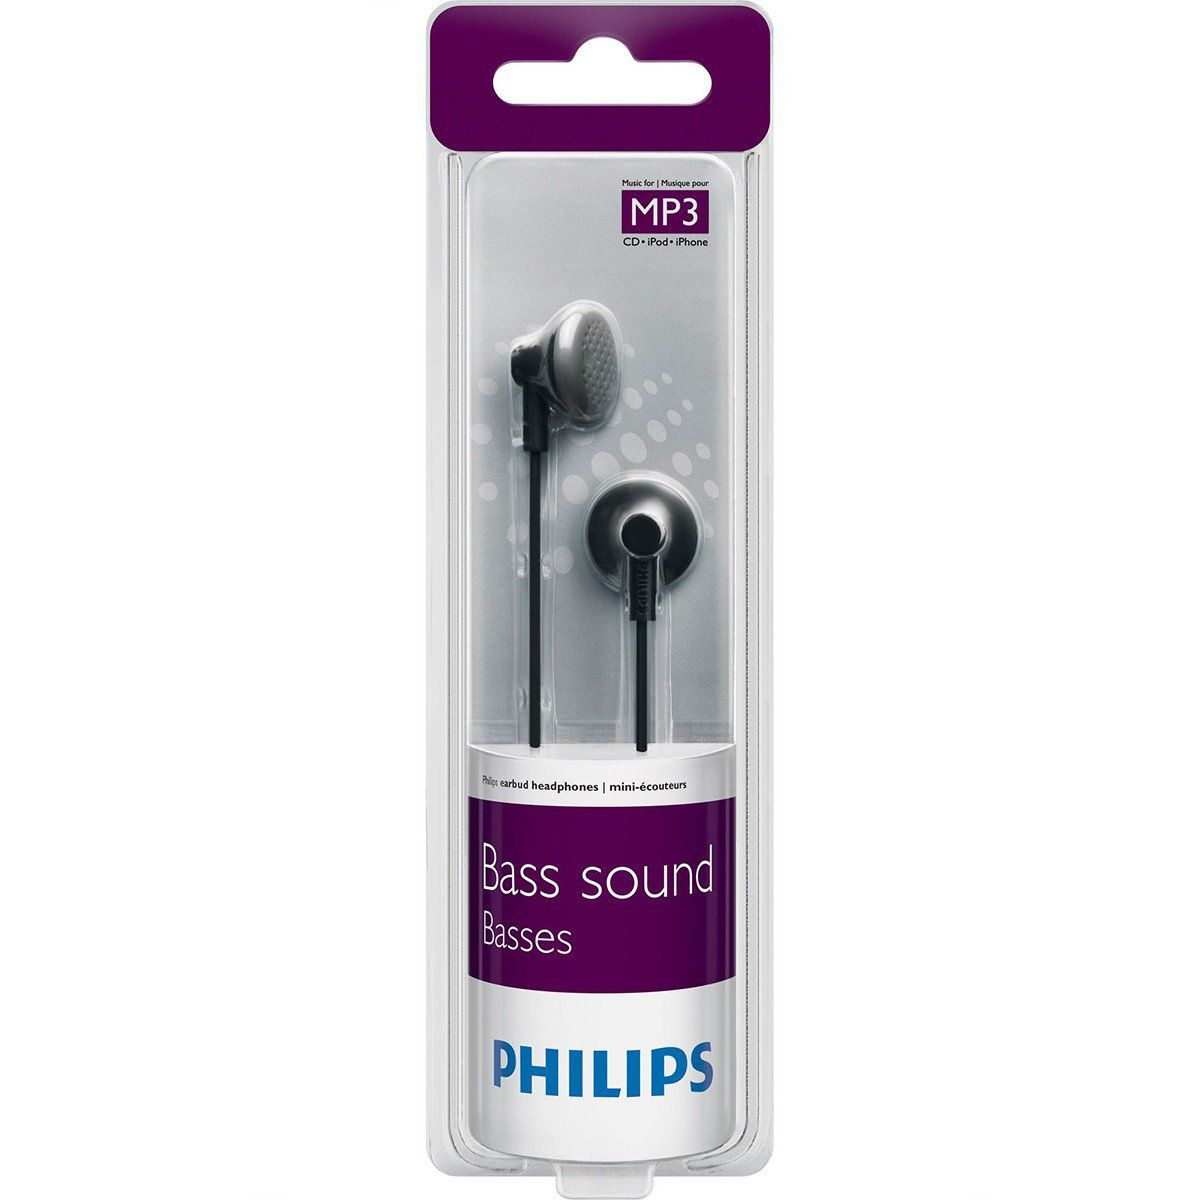 Philips SHE2000 Fone de Ouvido SHE-2000 In-Ear Emborrachado com Graves Potentes